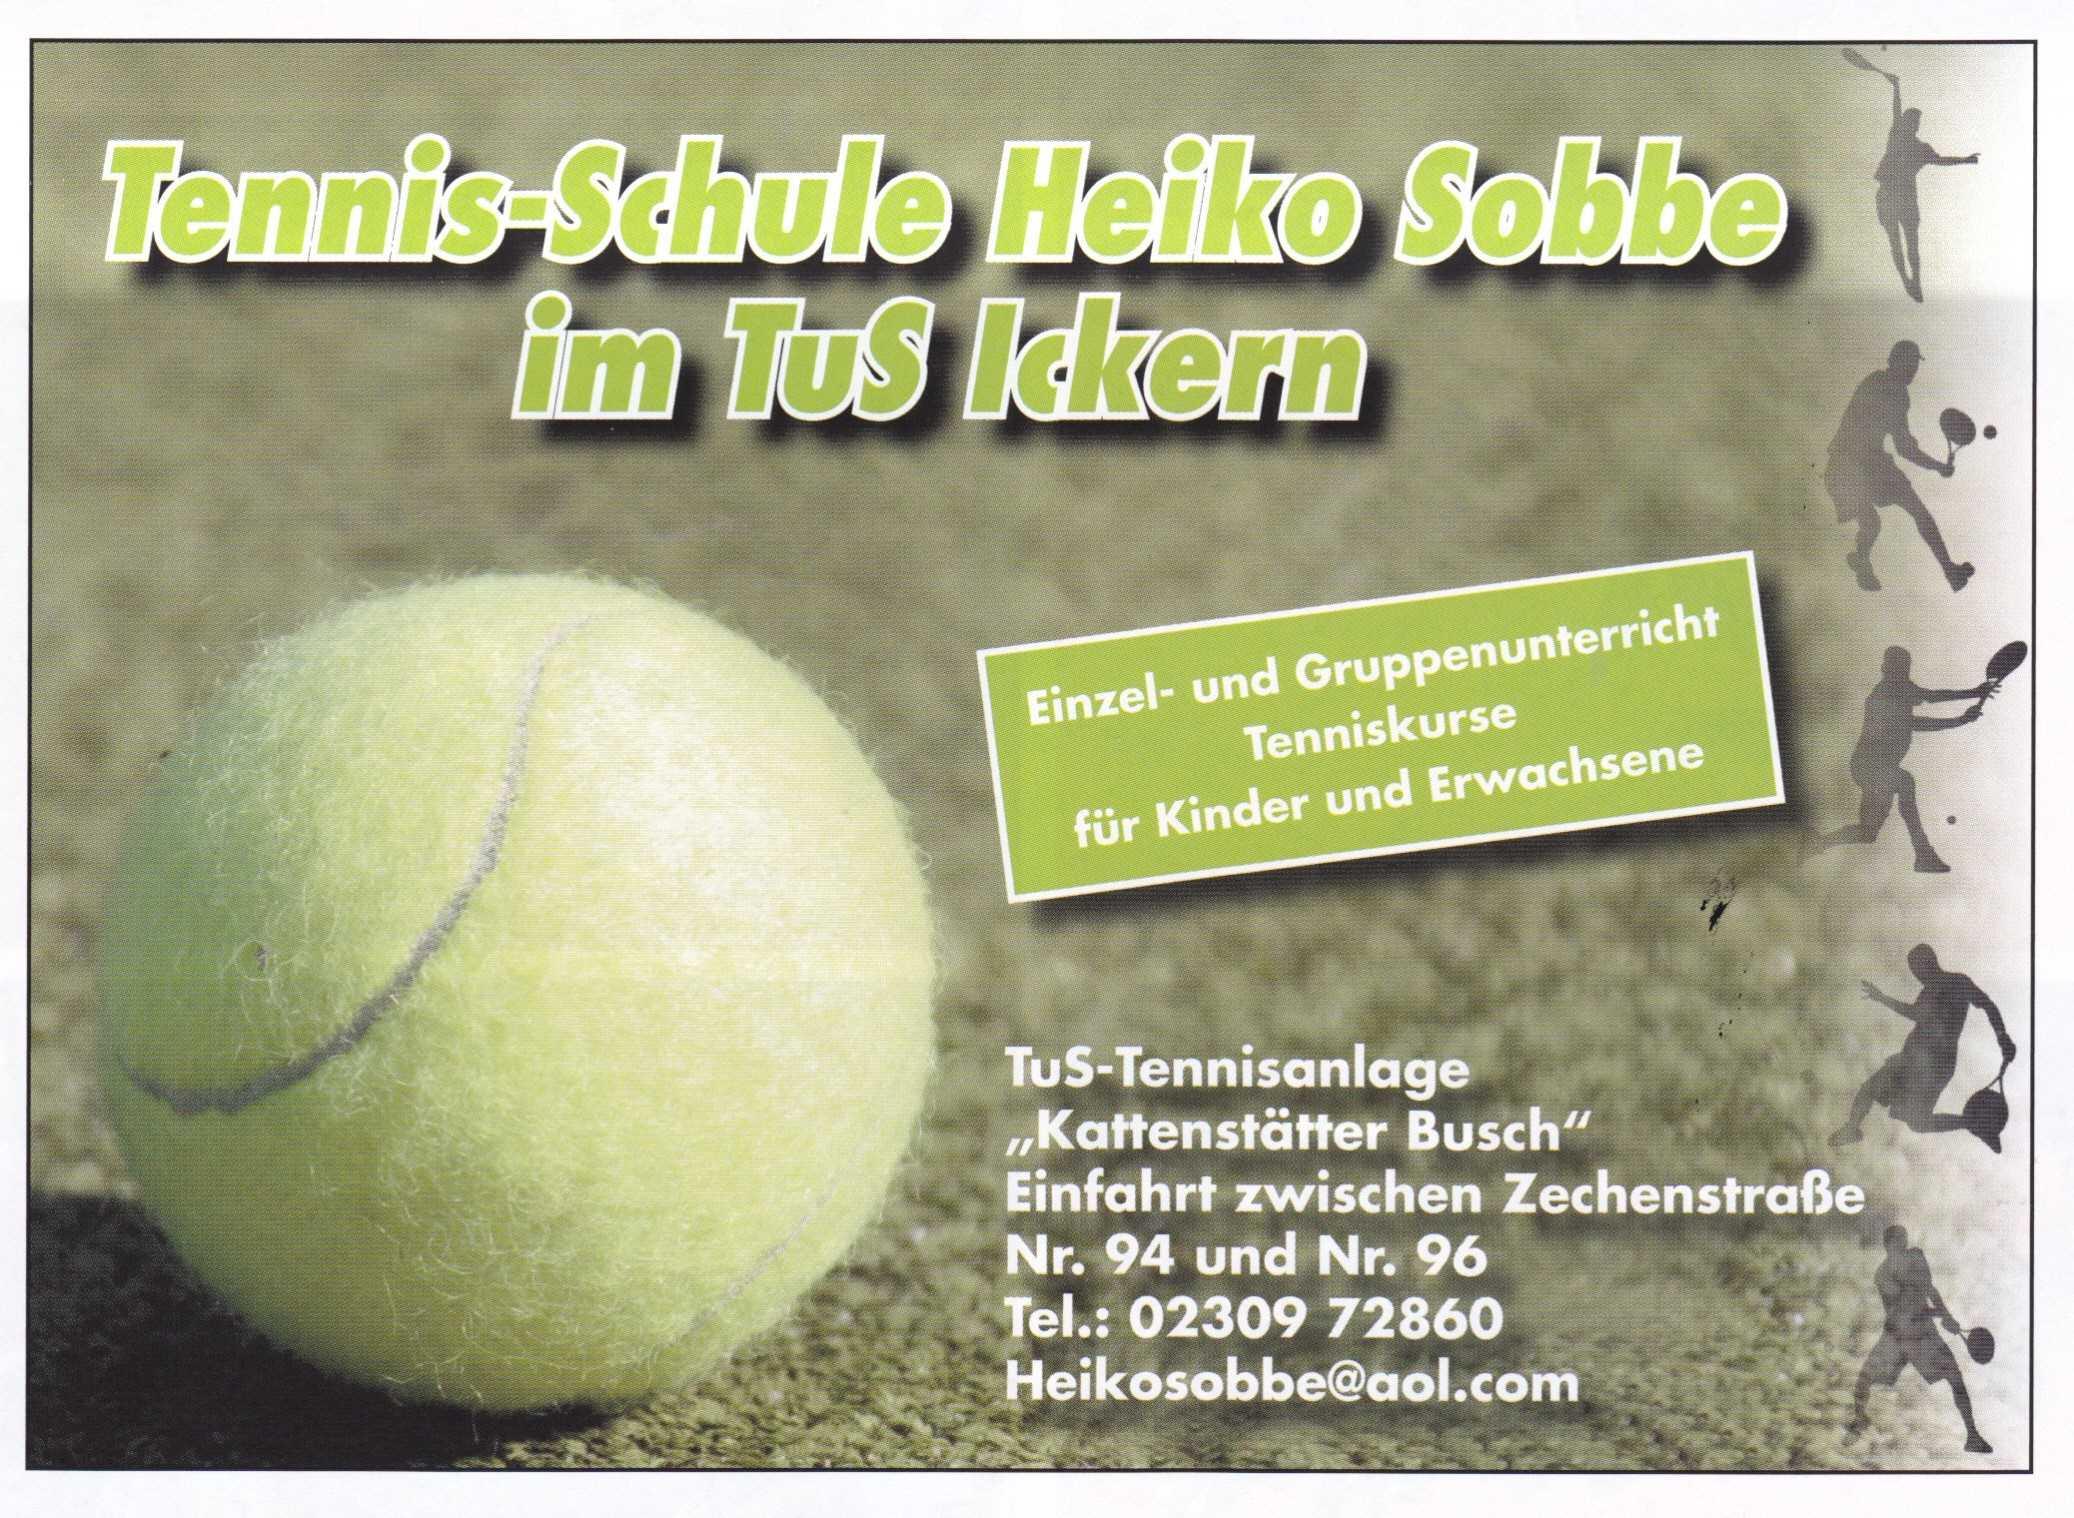 Tennis-Schule Heiko Sobbe